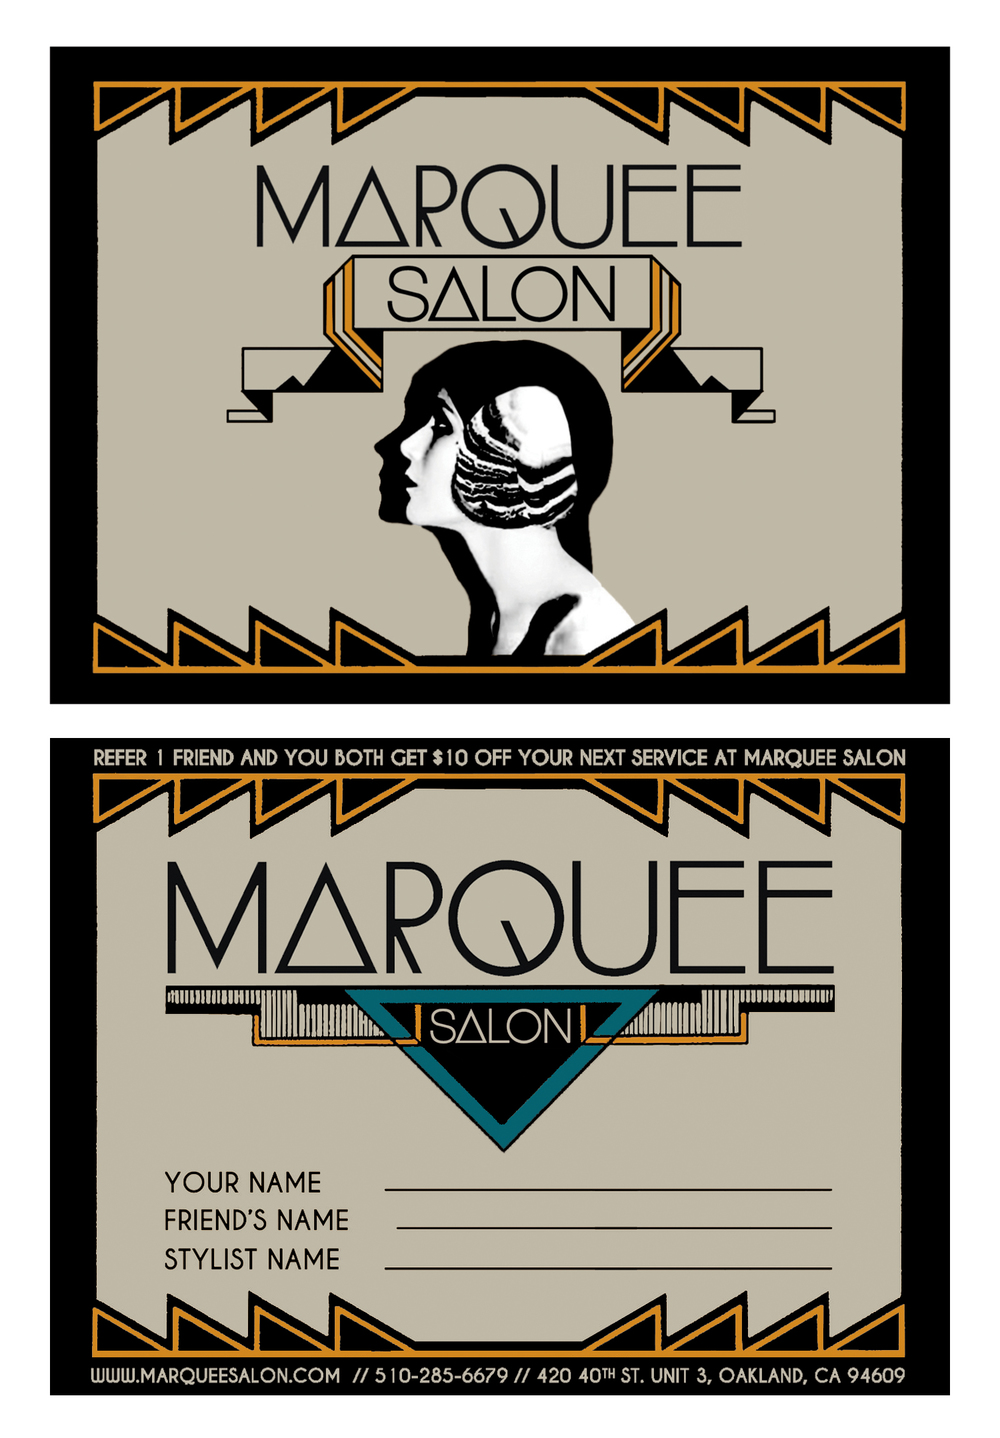 TARCADE DESIGNS FOR MARQUEE SALON / REFERRAL CARD FOR PRINT /©MARQUEE SALON